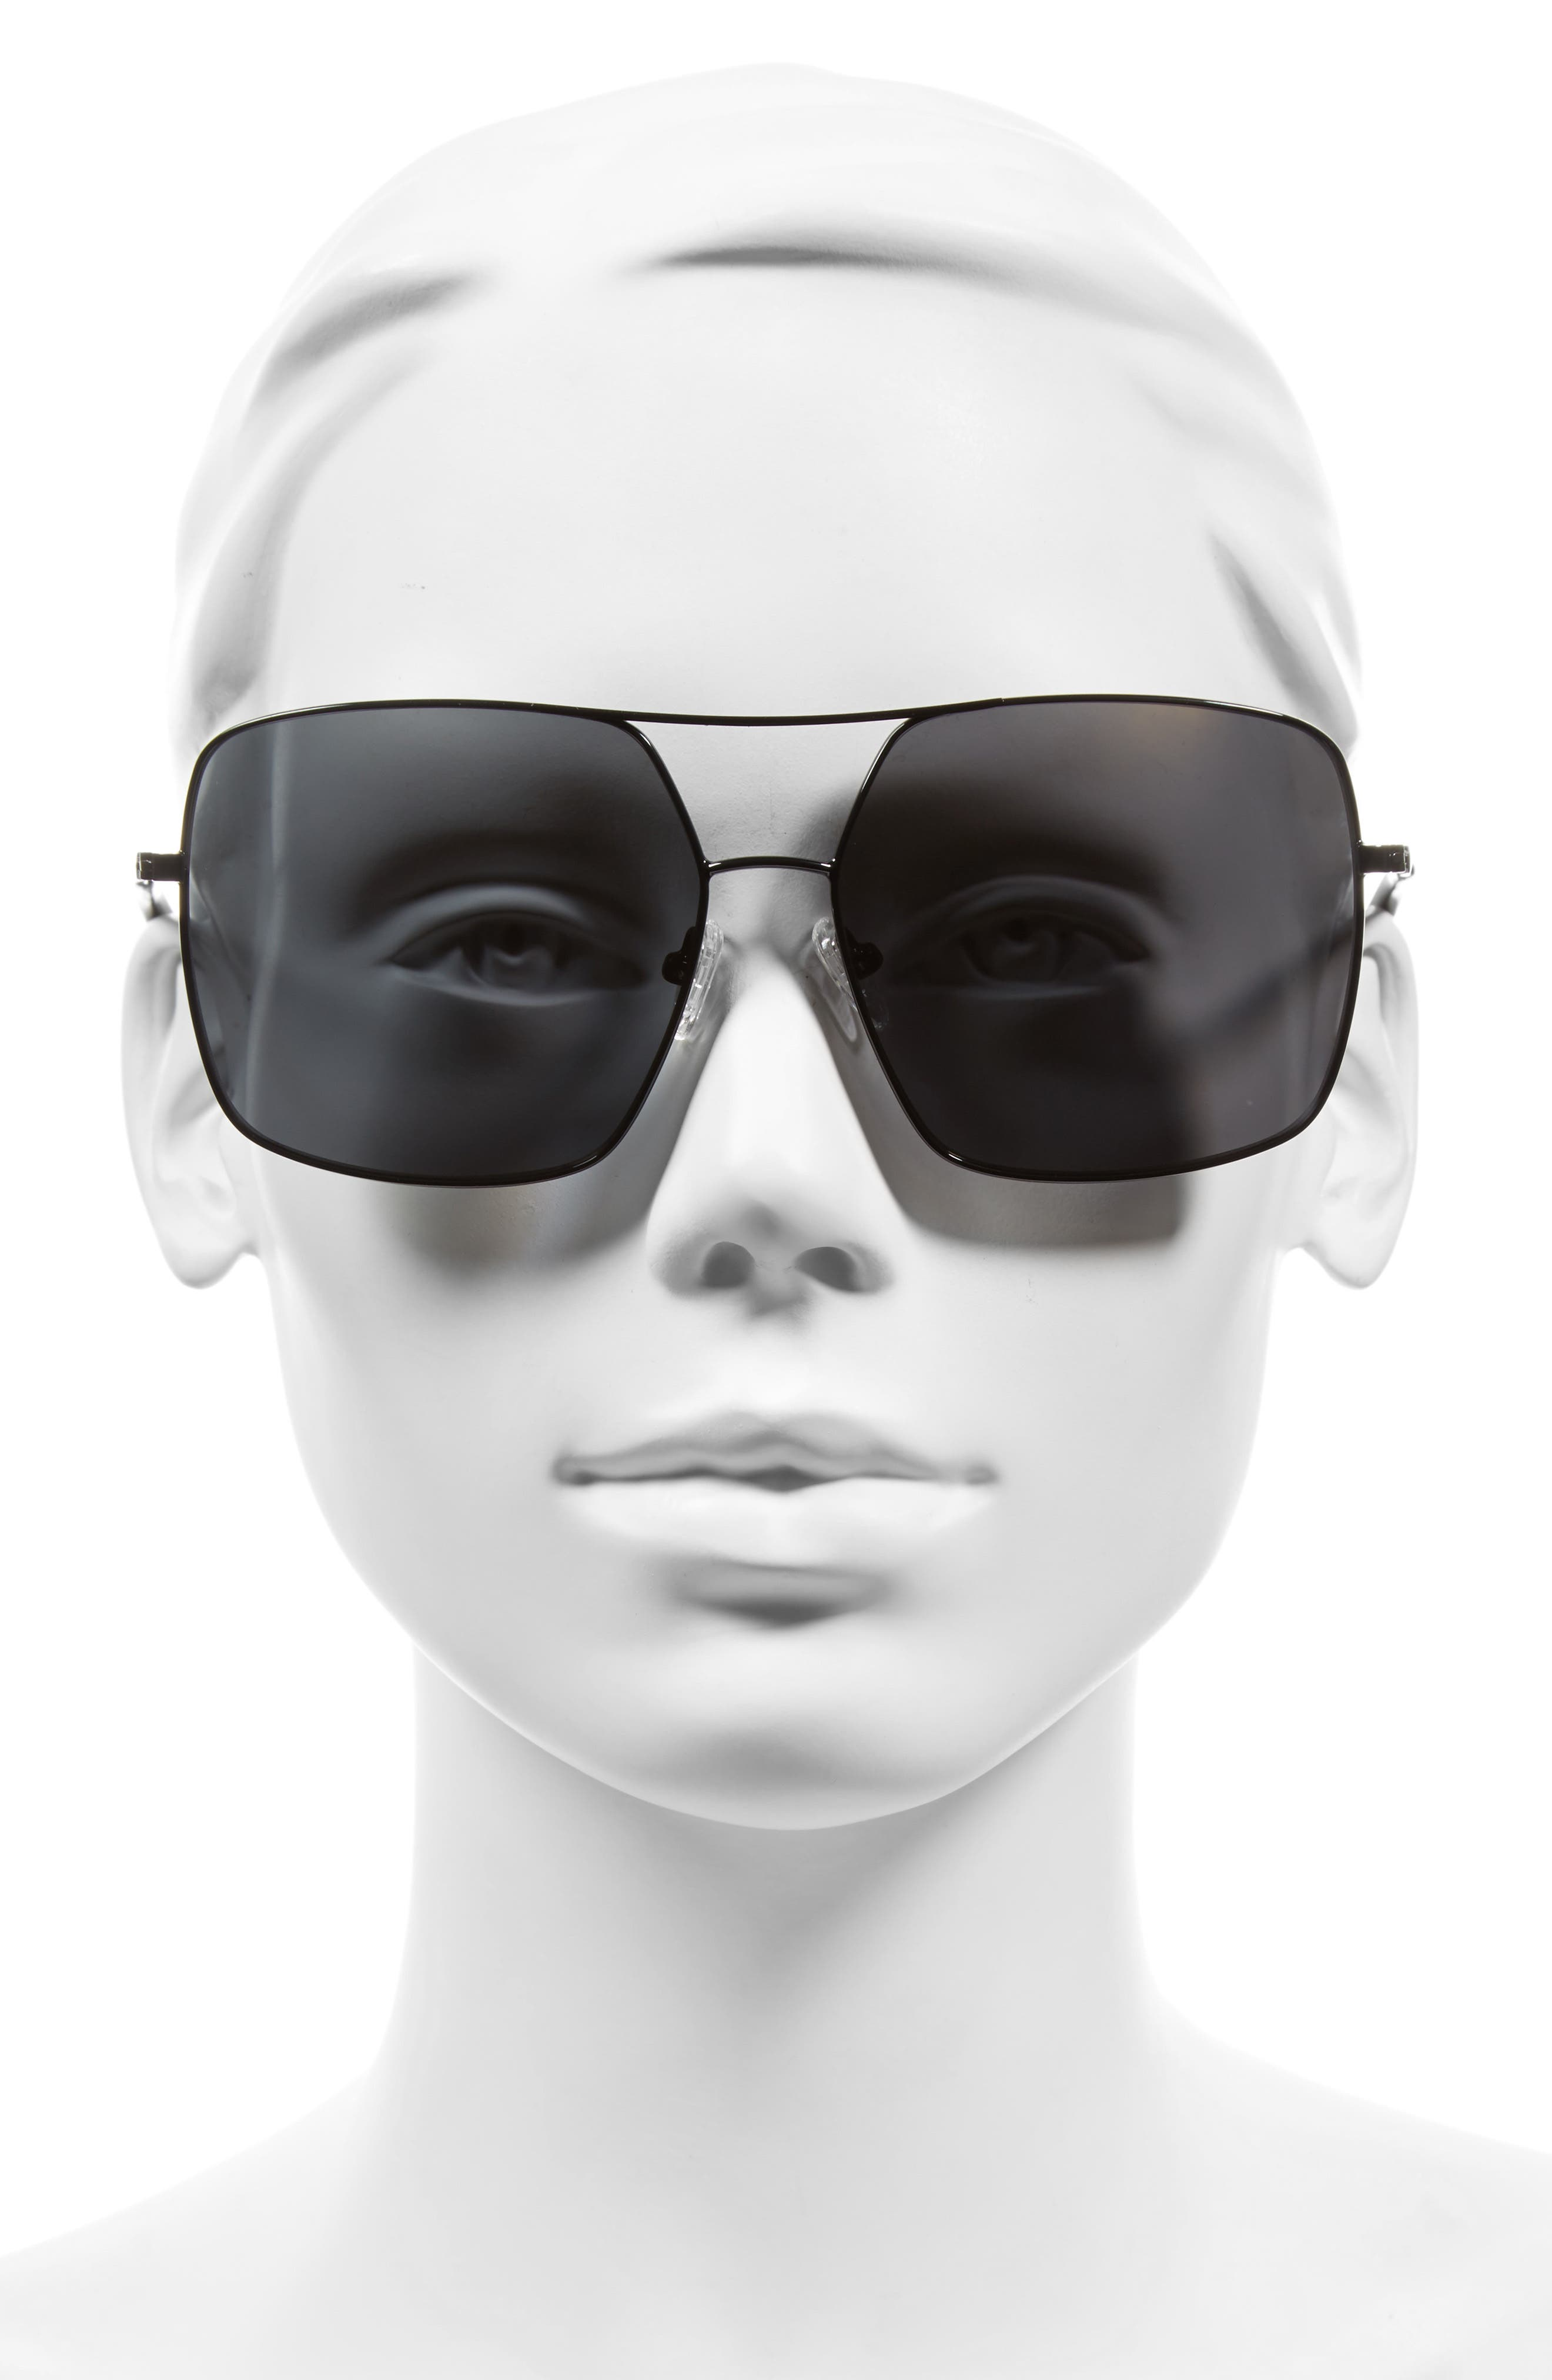 65mm Navigator Sunglasses,                             Alternate thumbnail 2, color,                             001